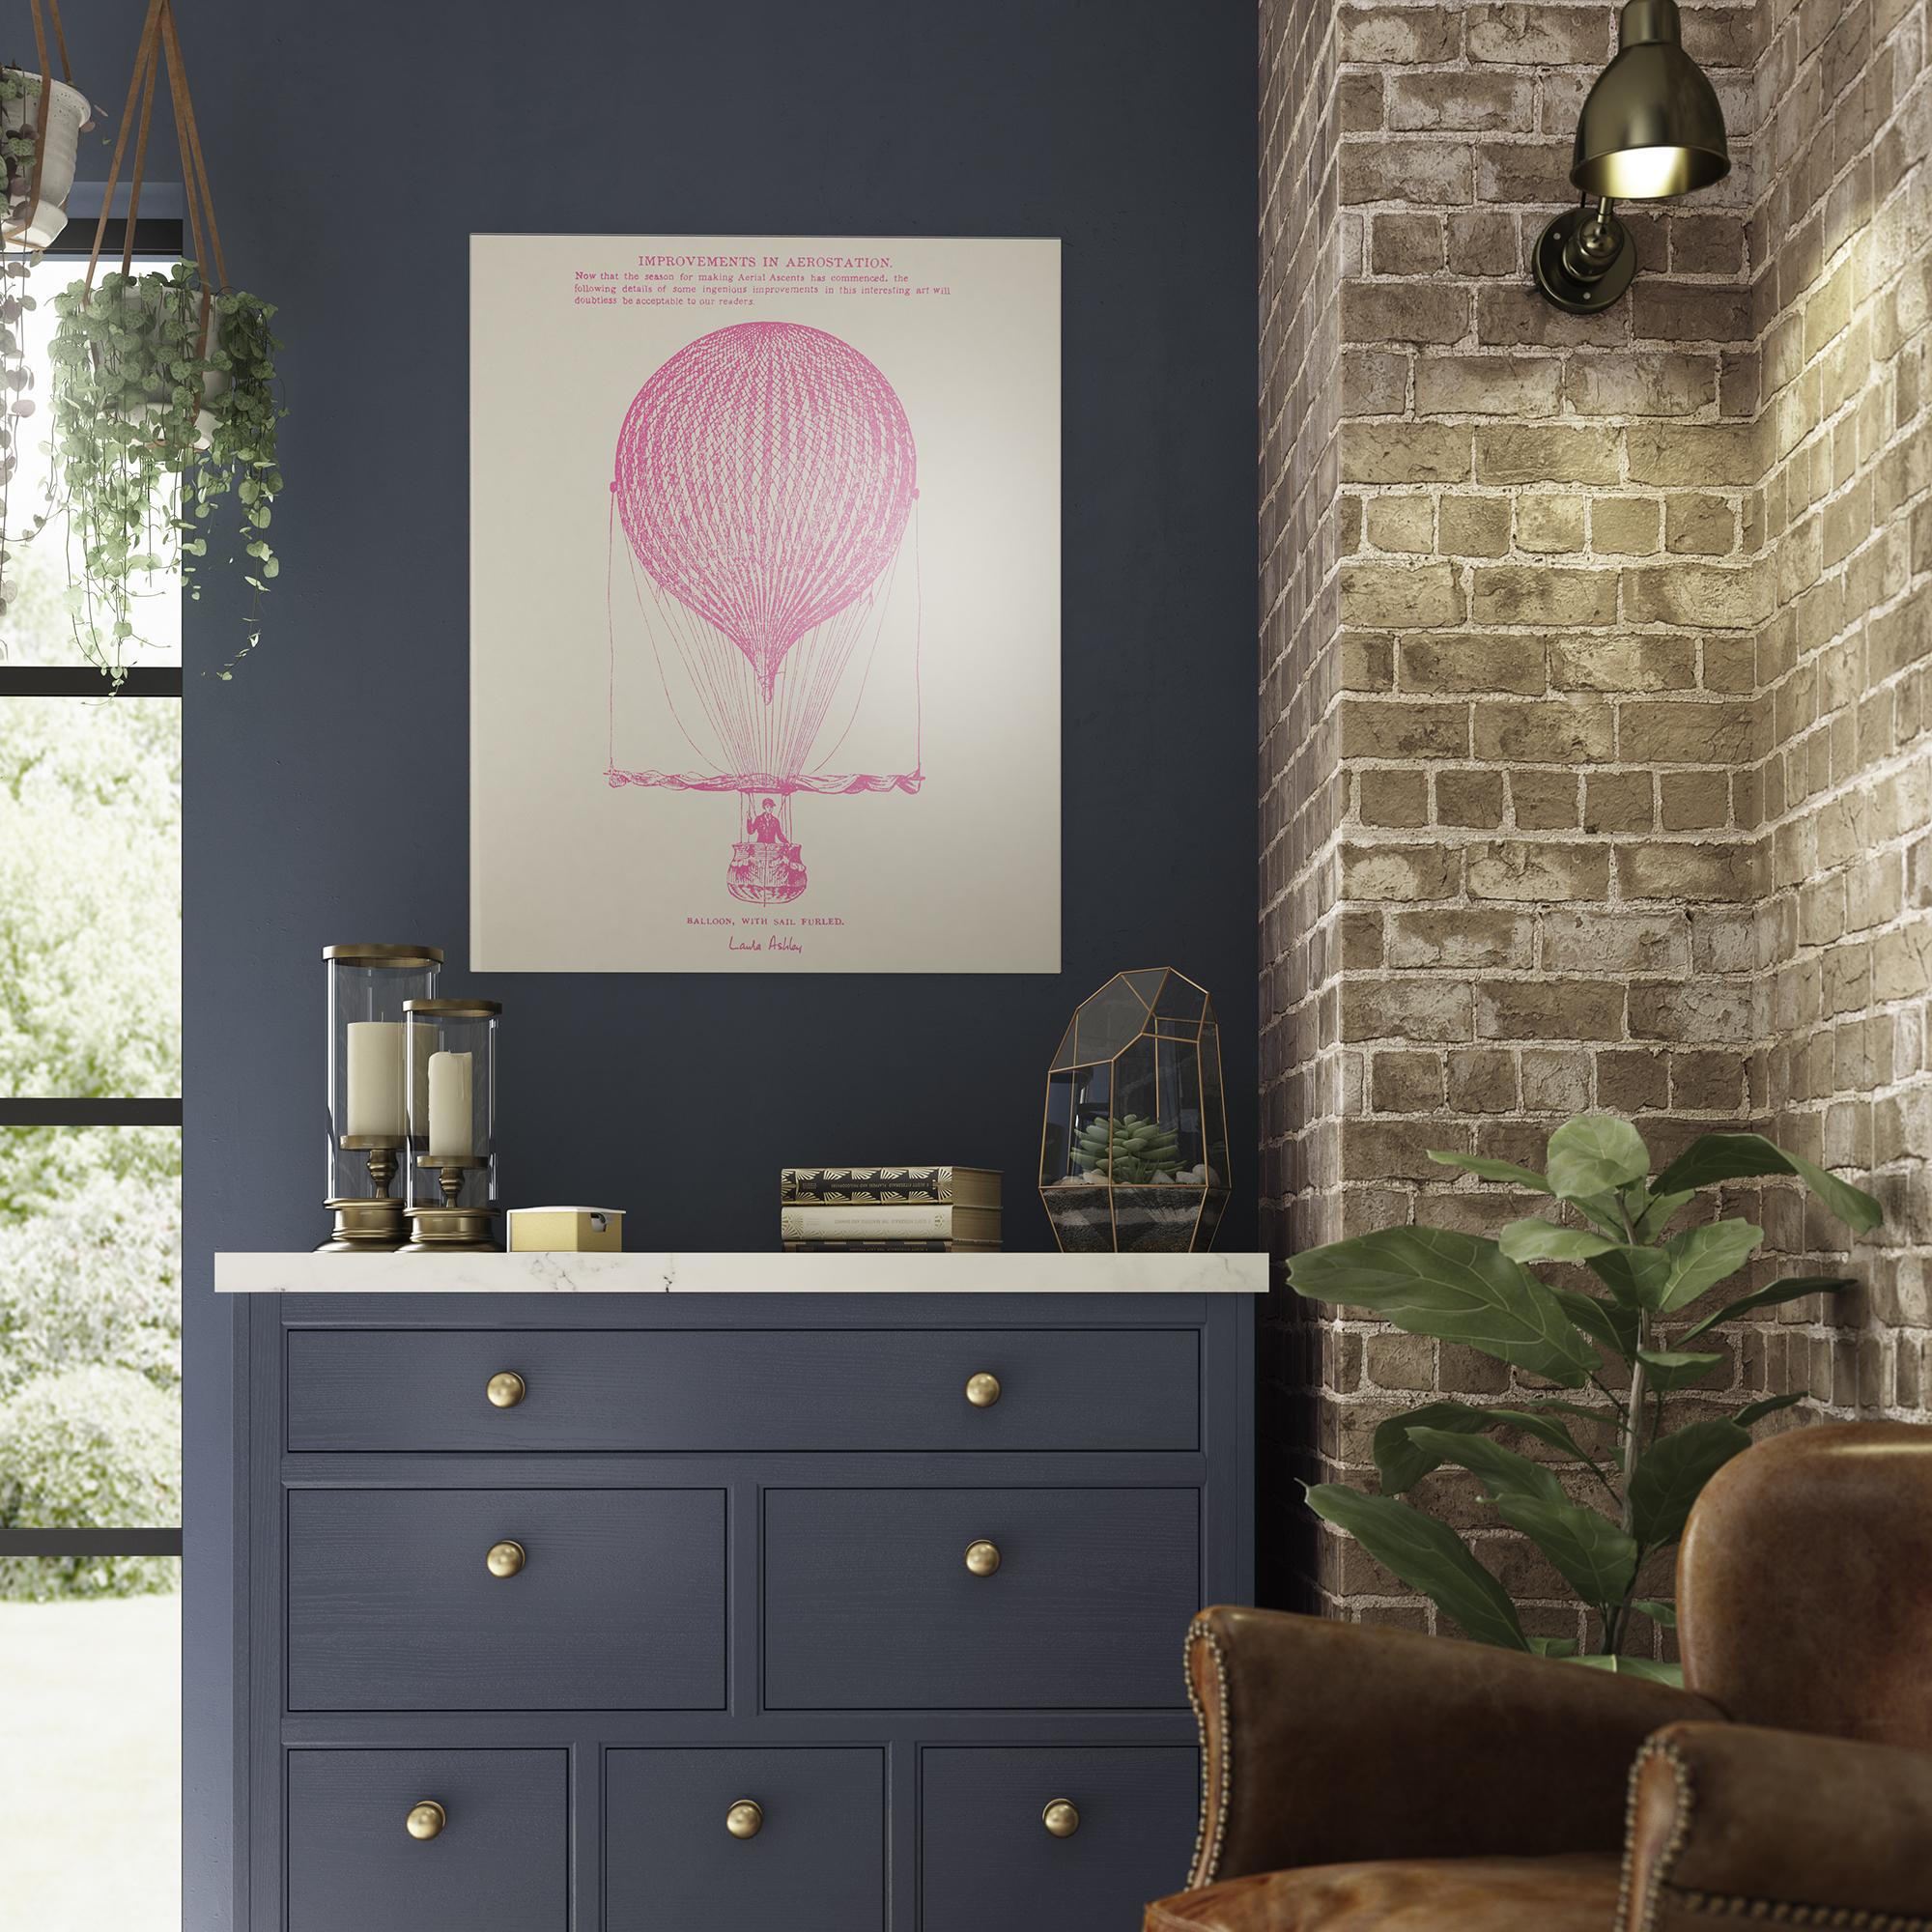 LA52970 Balloon Splashback 600x750mm Roomset